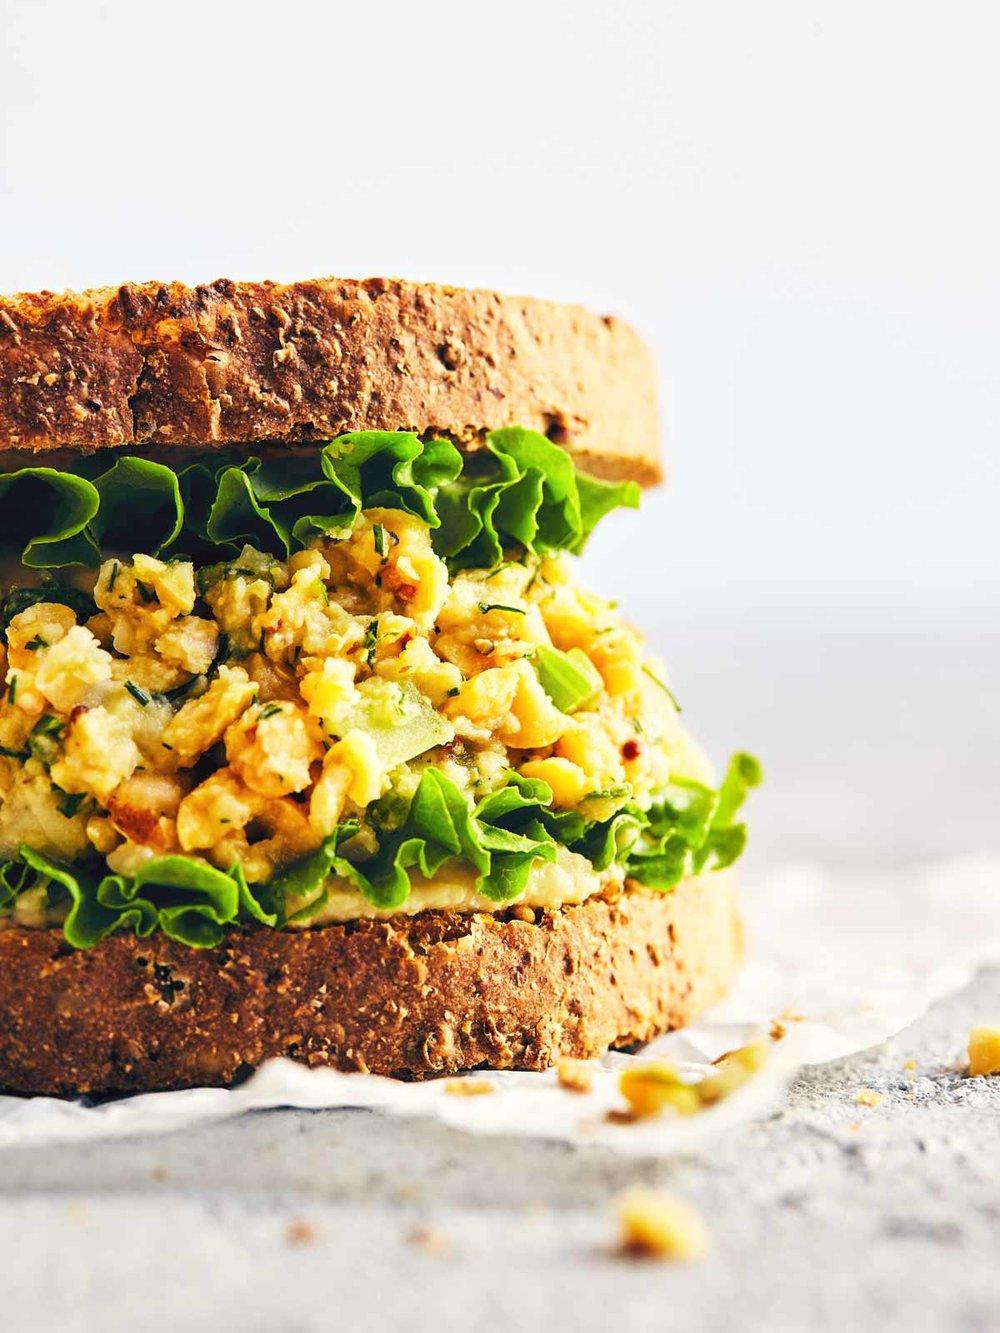 Lemon & Dill Chickpea Sandwich | Evergreen Kitchen | Vegan